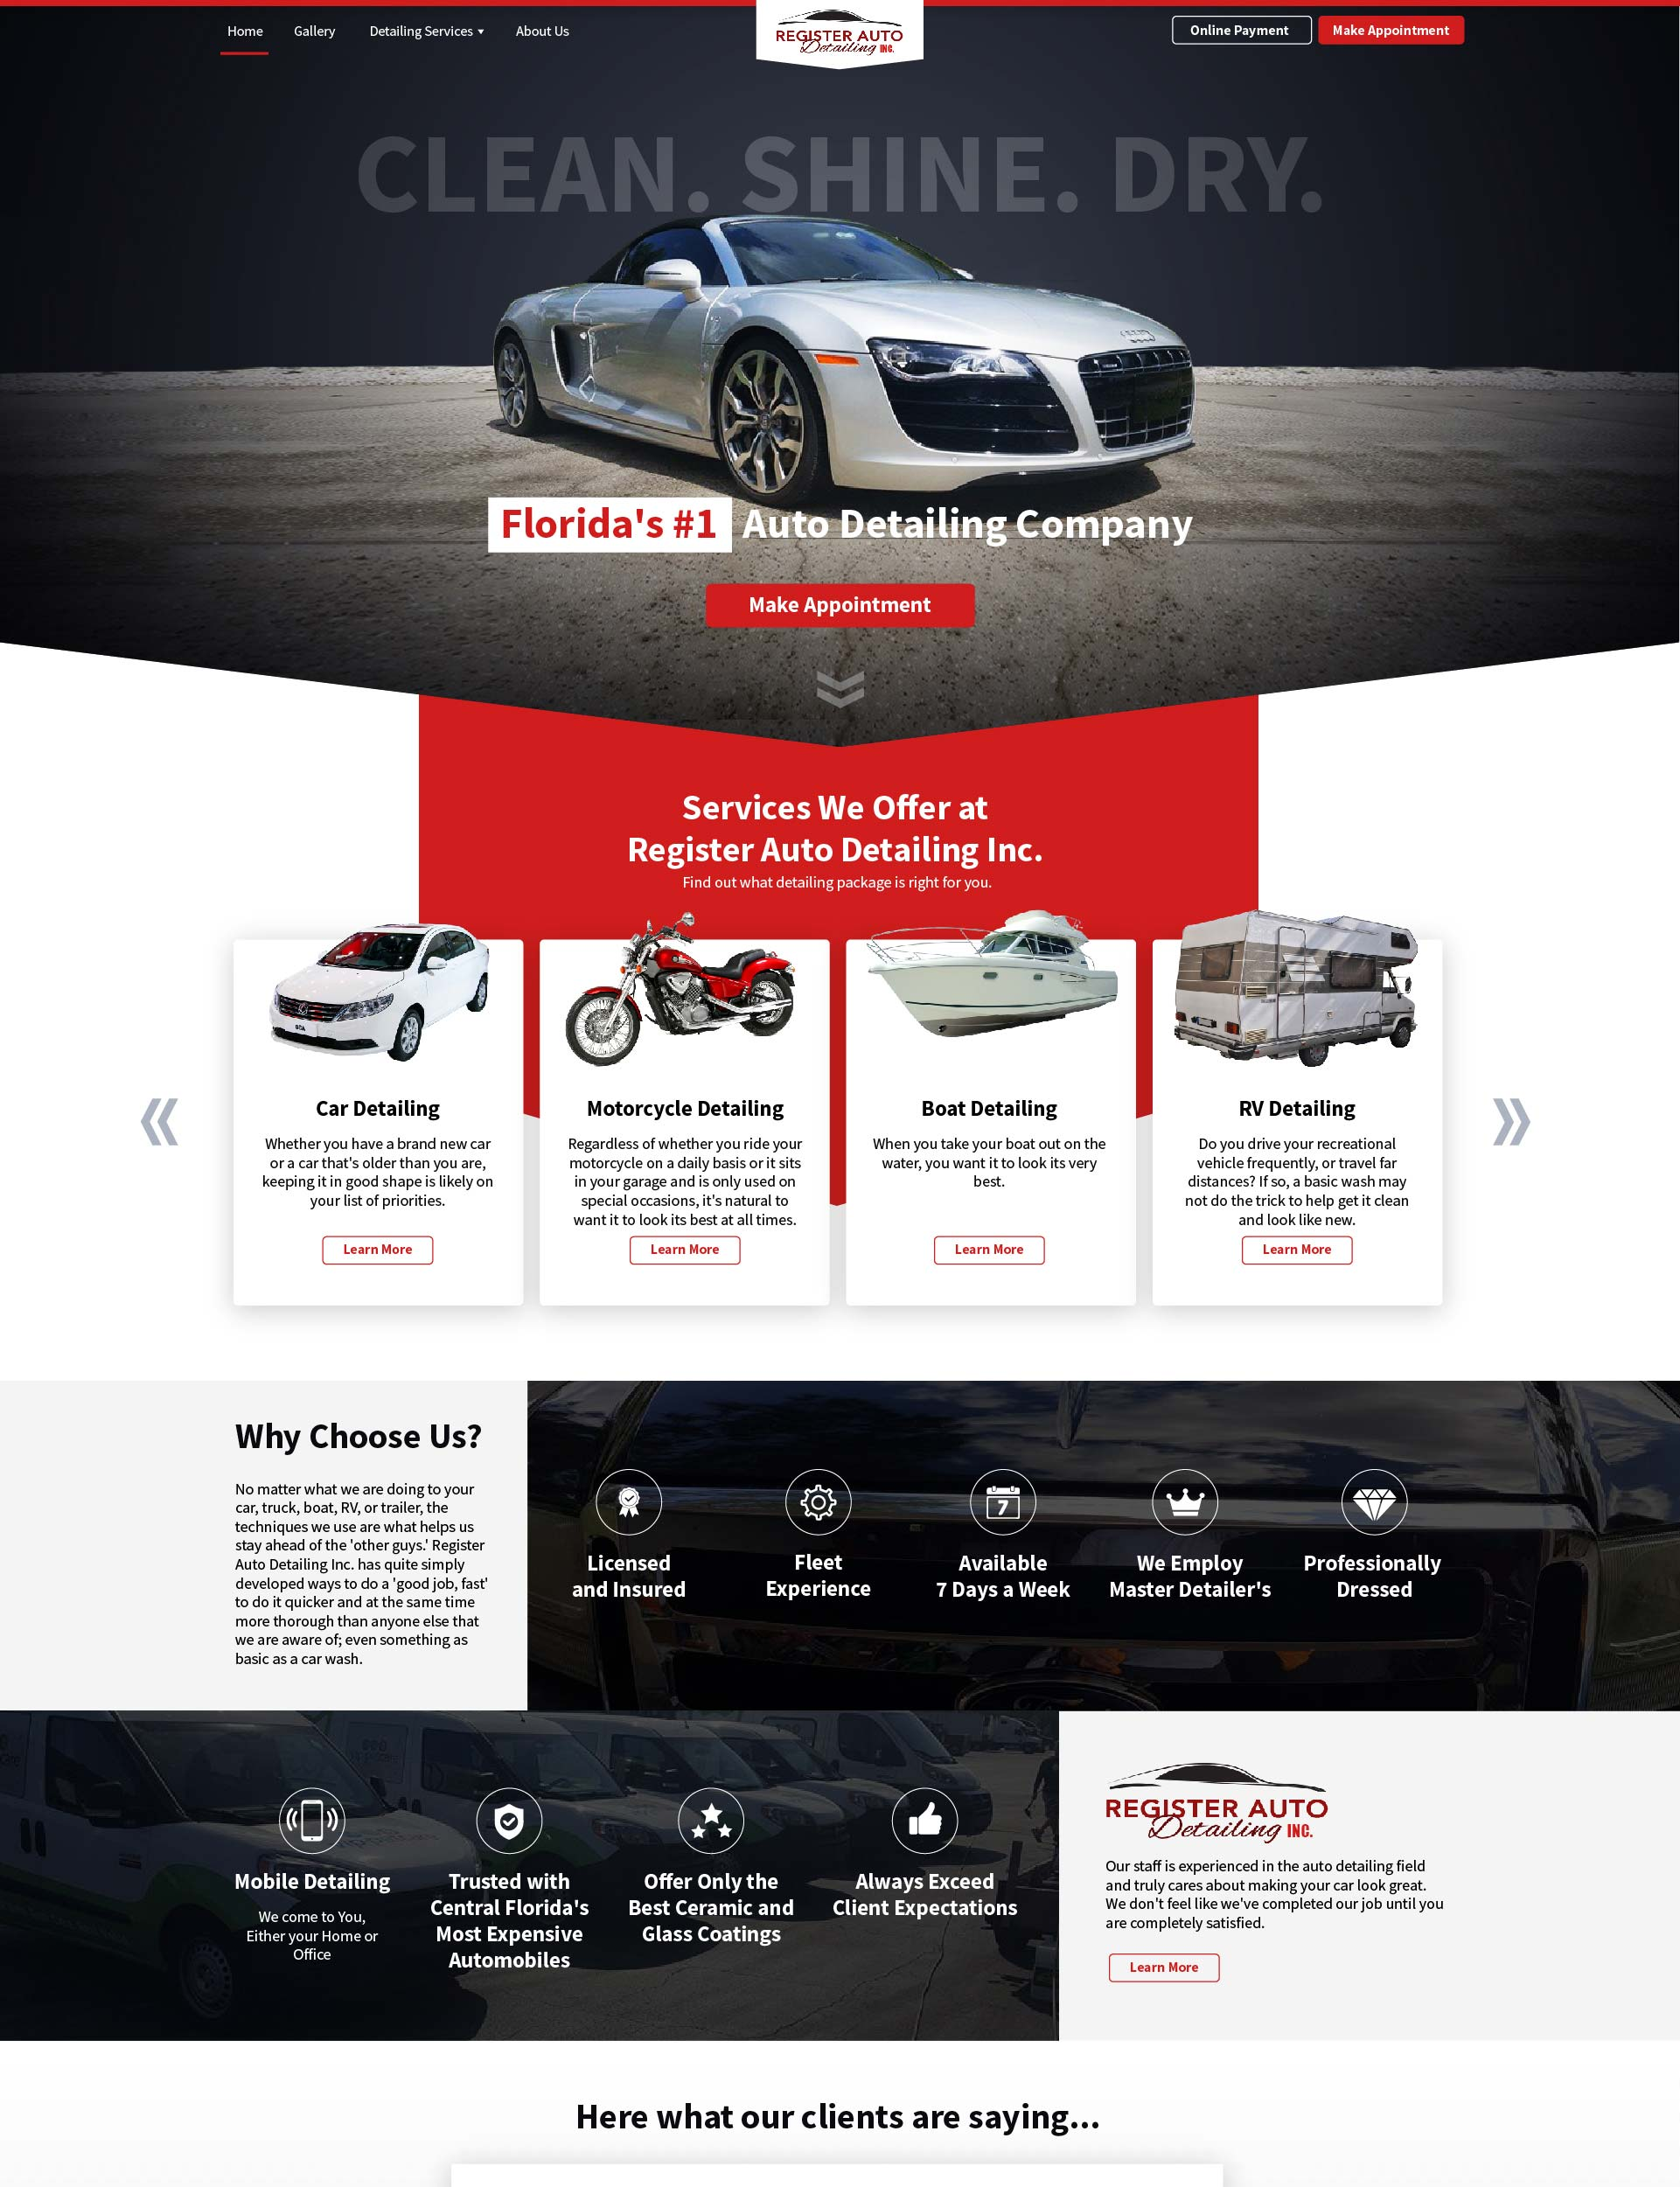 Register Auto Detailing Mockup Web Lakeland redesign